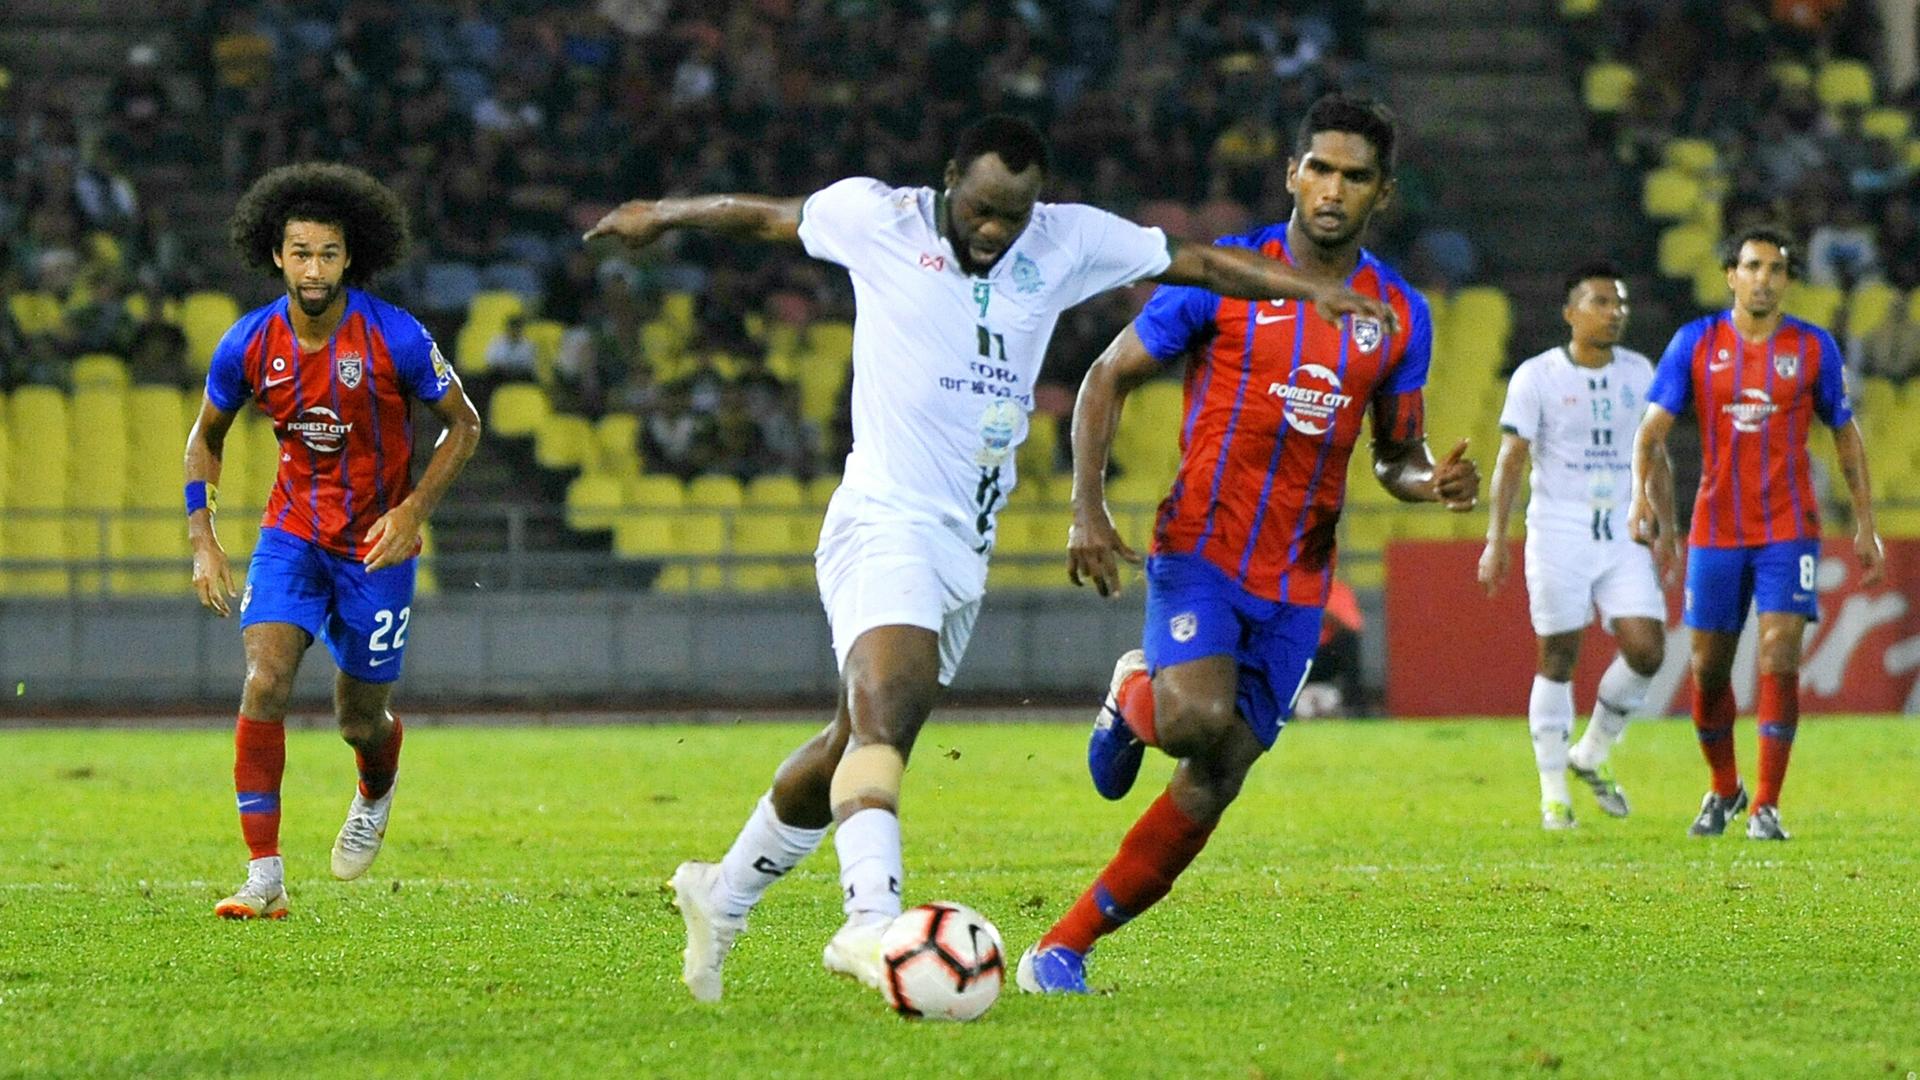 Davy Angan, Melaka v Johor Darul Ta'zim, Malaysia Super League, 25 June 2019